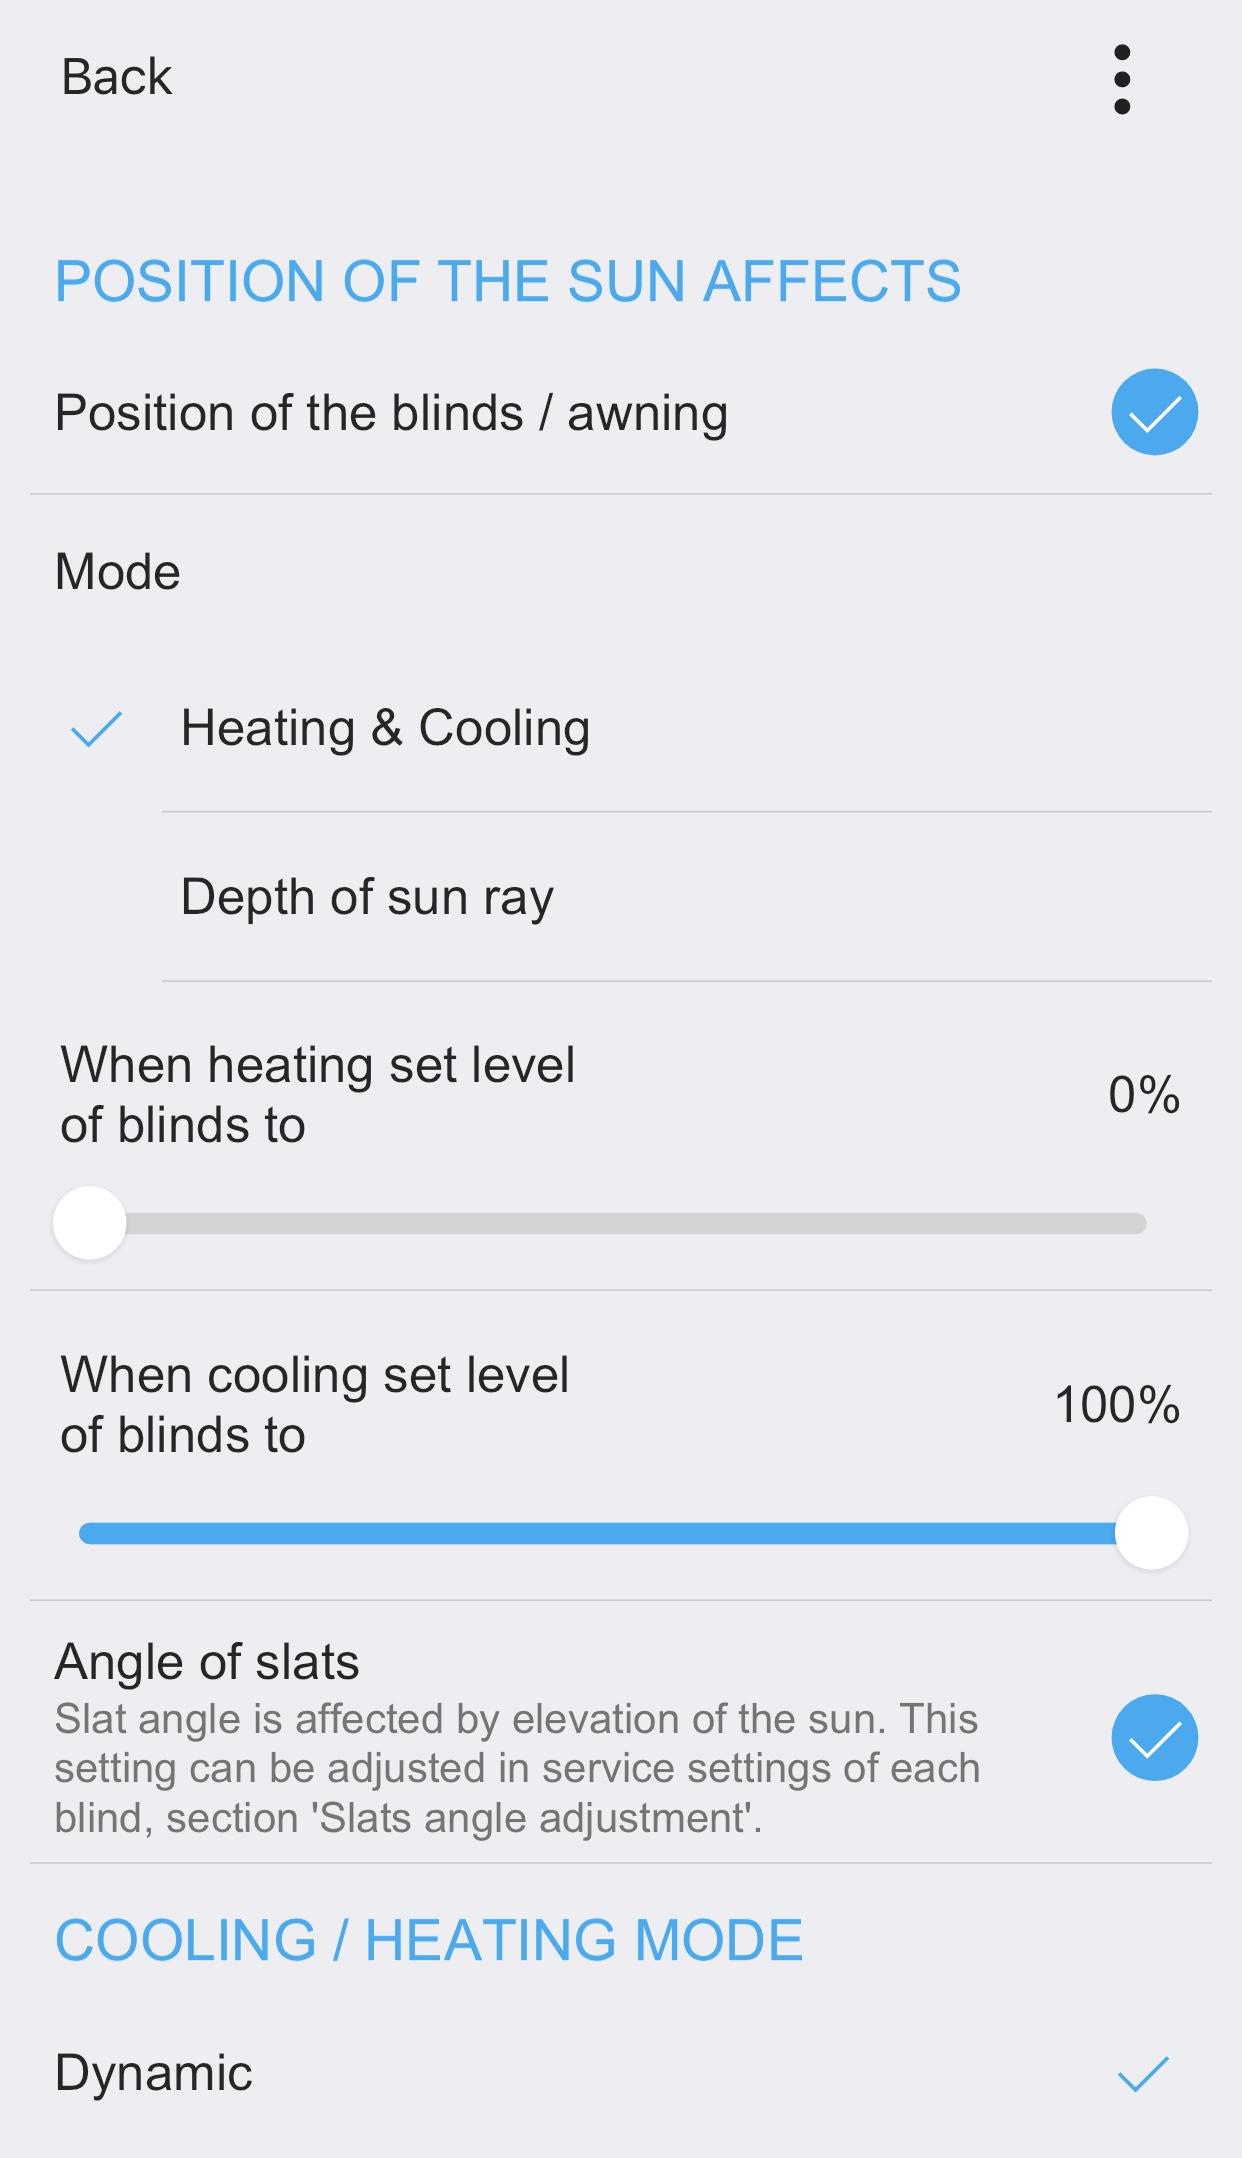 Mode chauffage / refroidissement